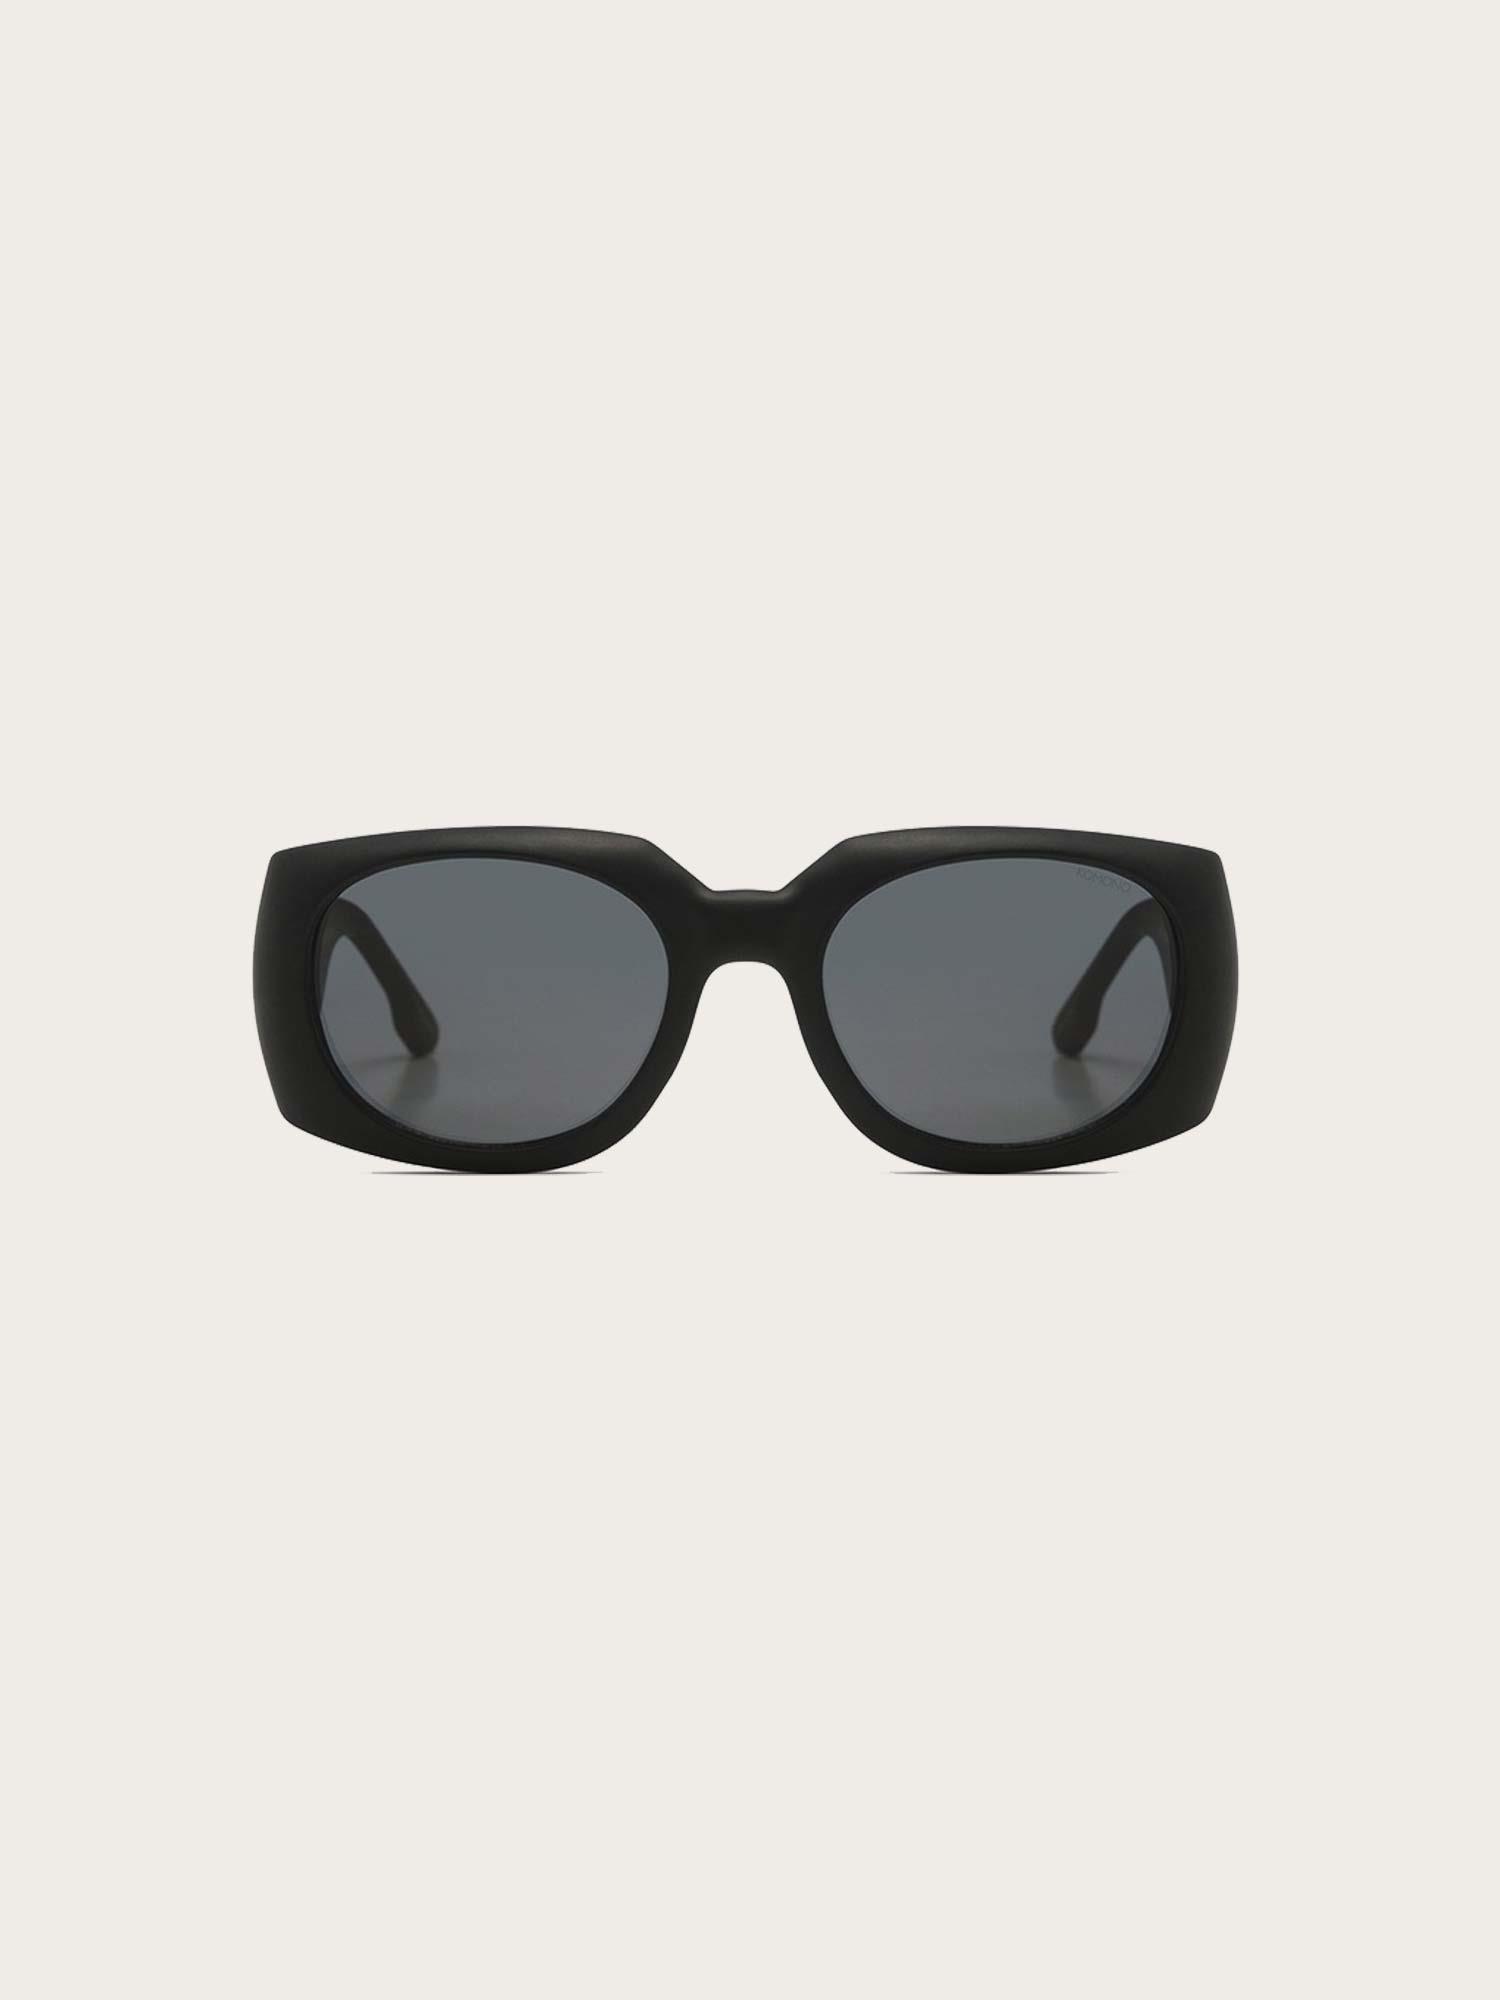 M&H toppliste: 11 stilige store solbriller